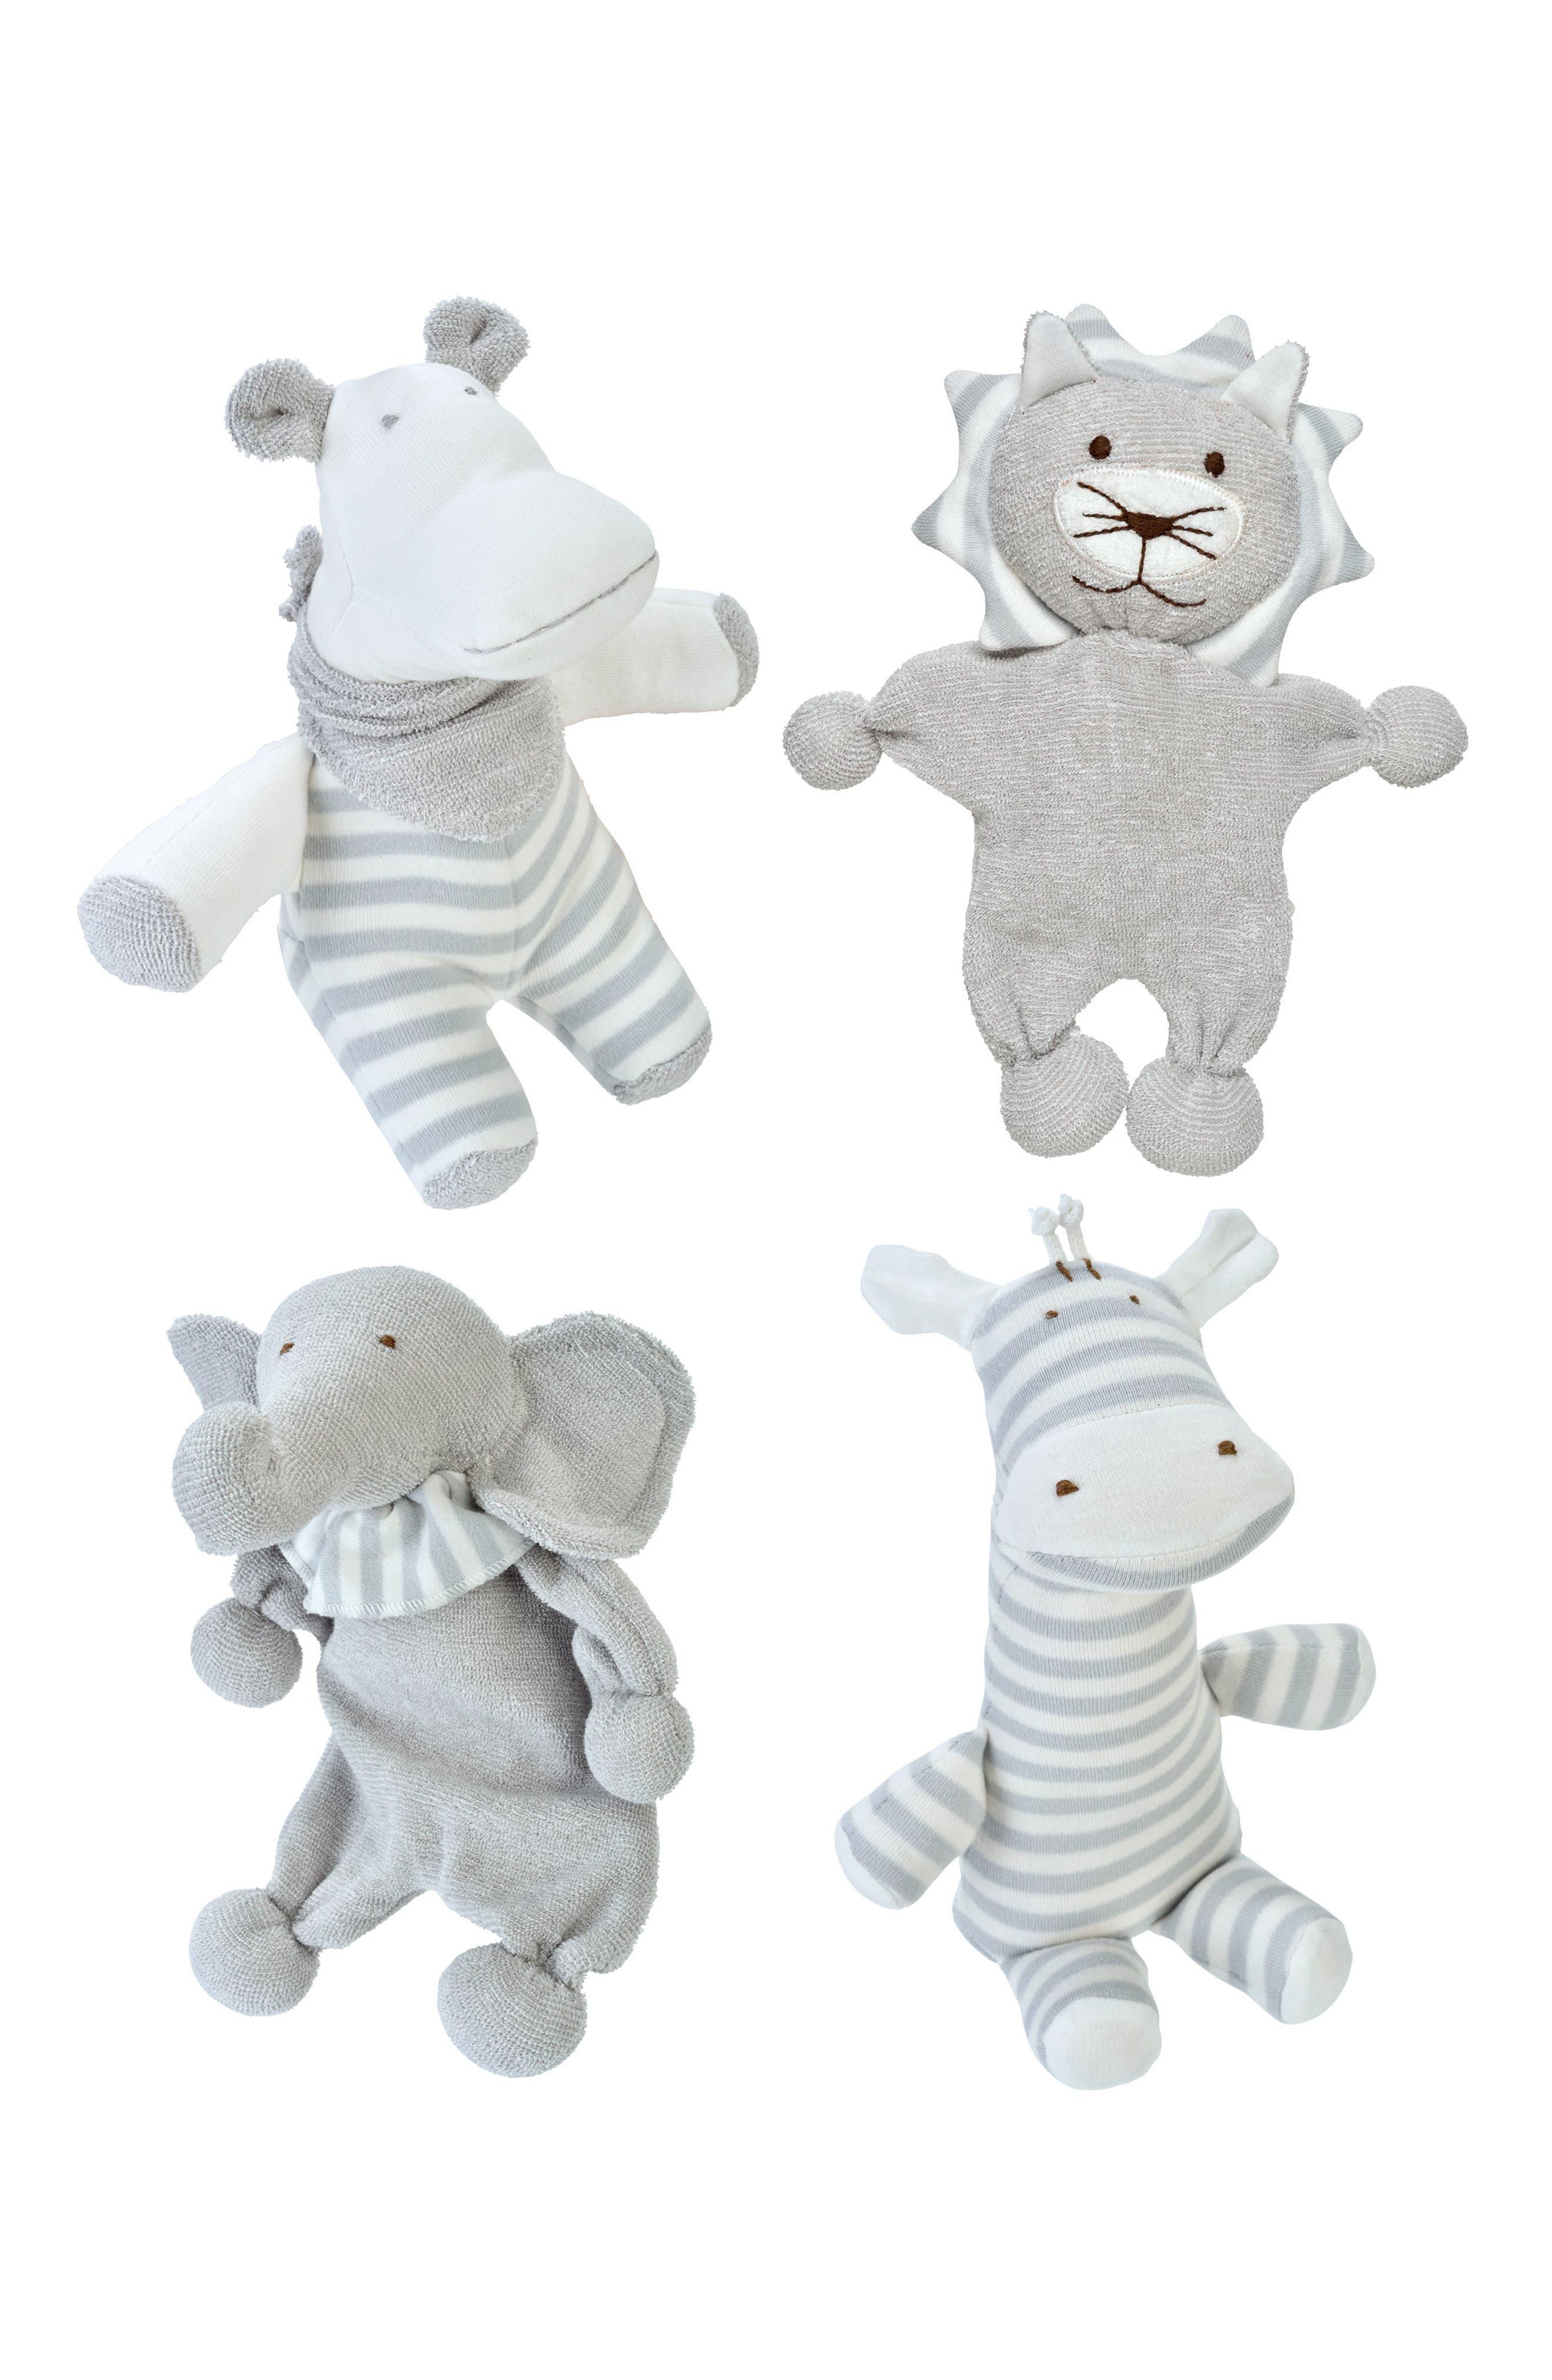 4-Piece Safari Stuffed Animal Set,                             Main thumbnail 1, color,                             021